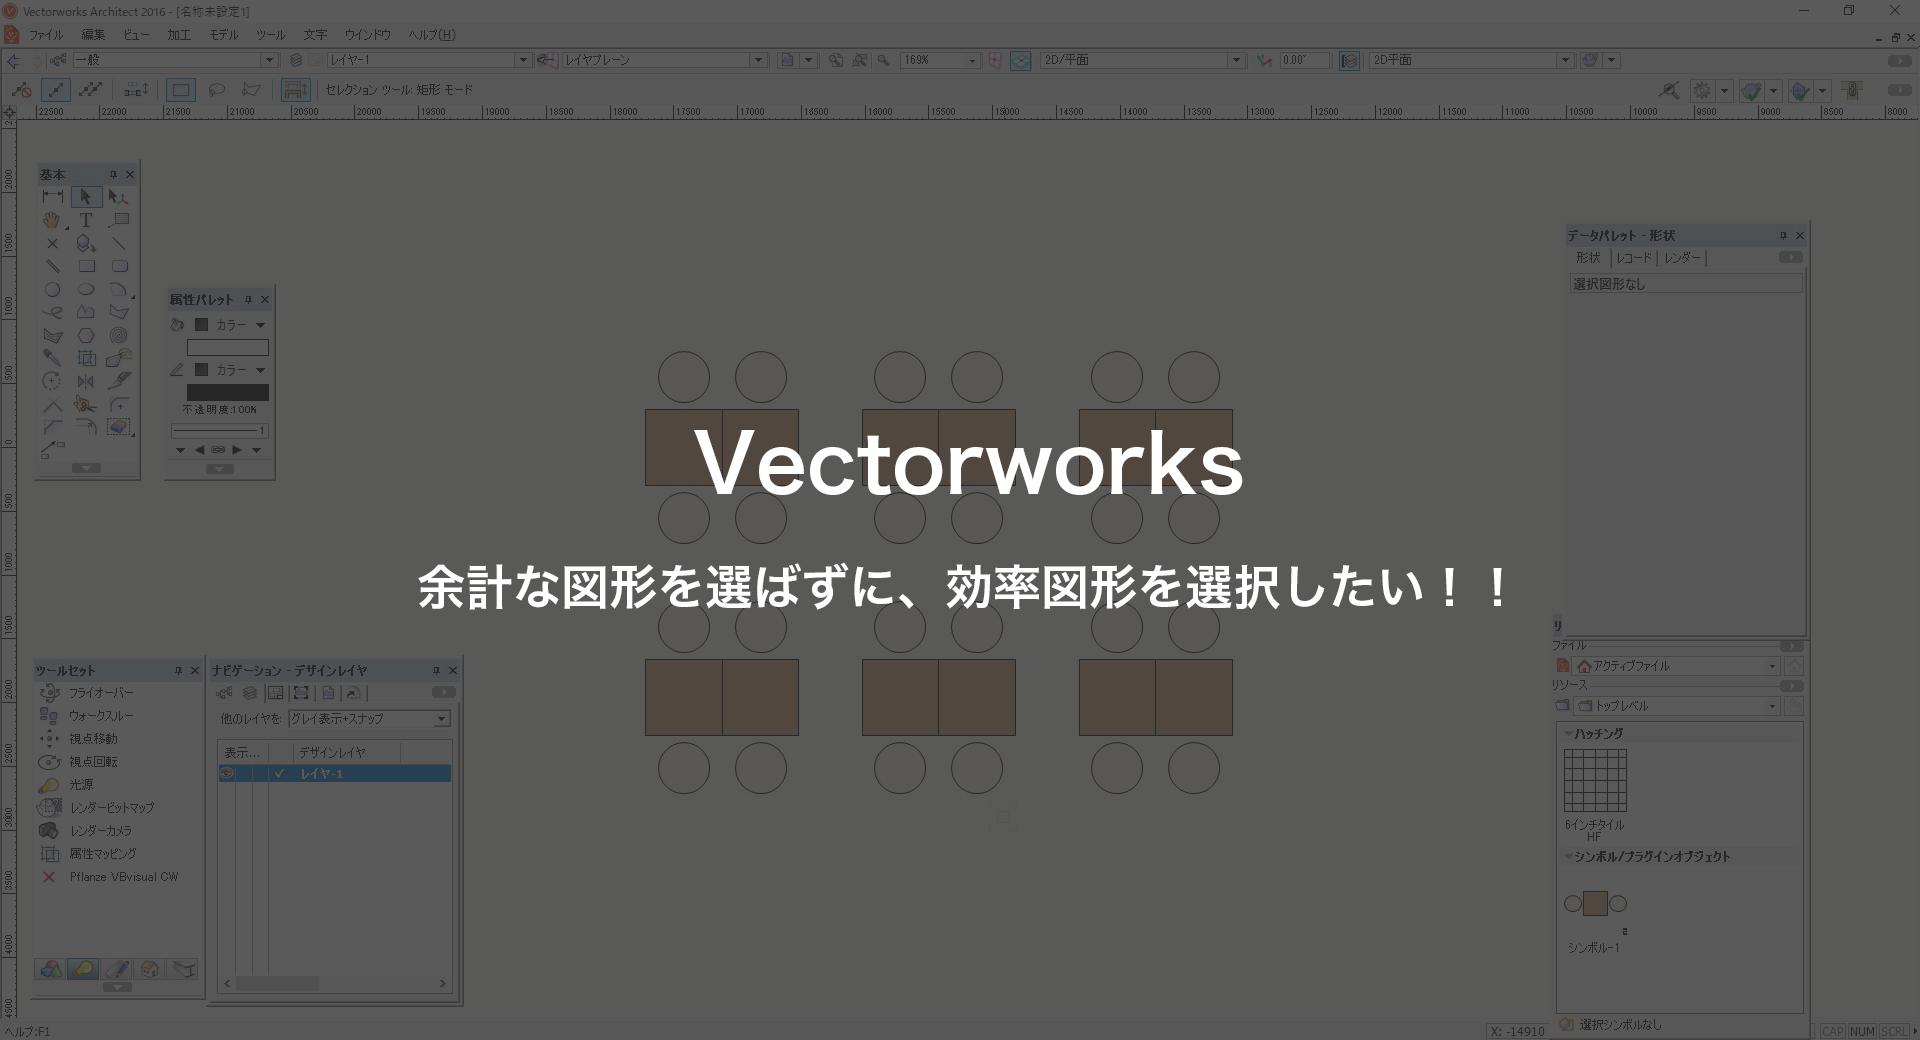 Vectorworksで必要な図形を楽に選択できる、「図形選択マクロ」の使い方。